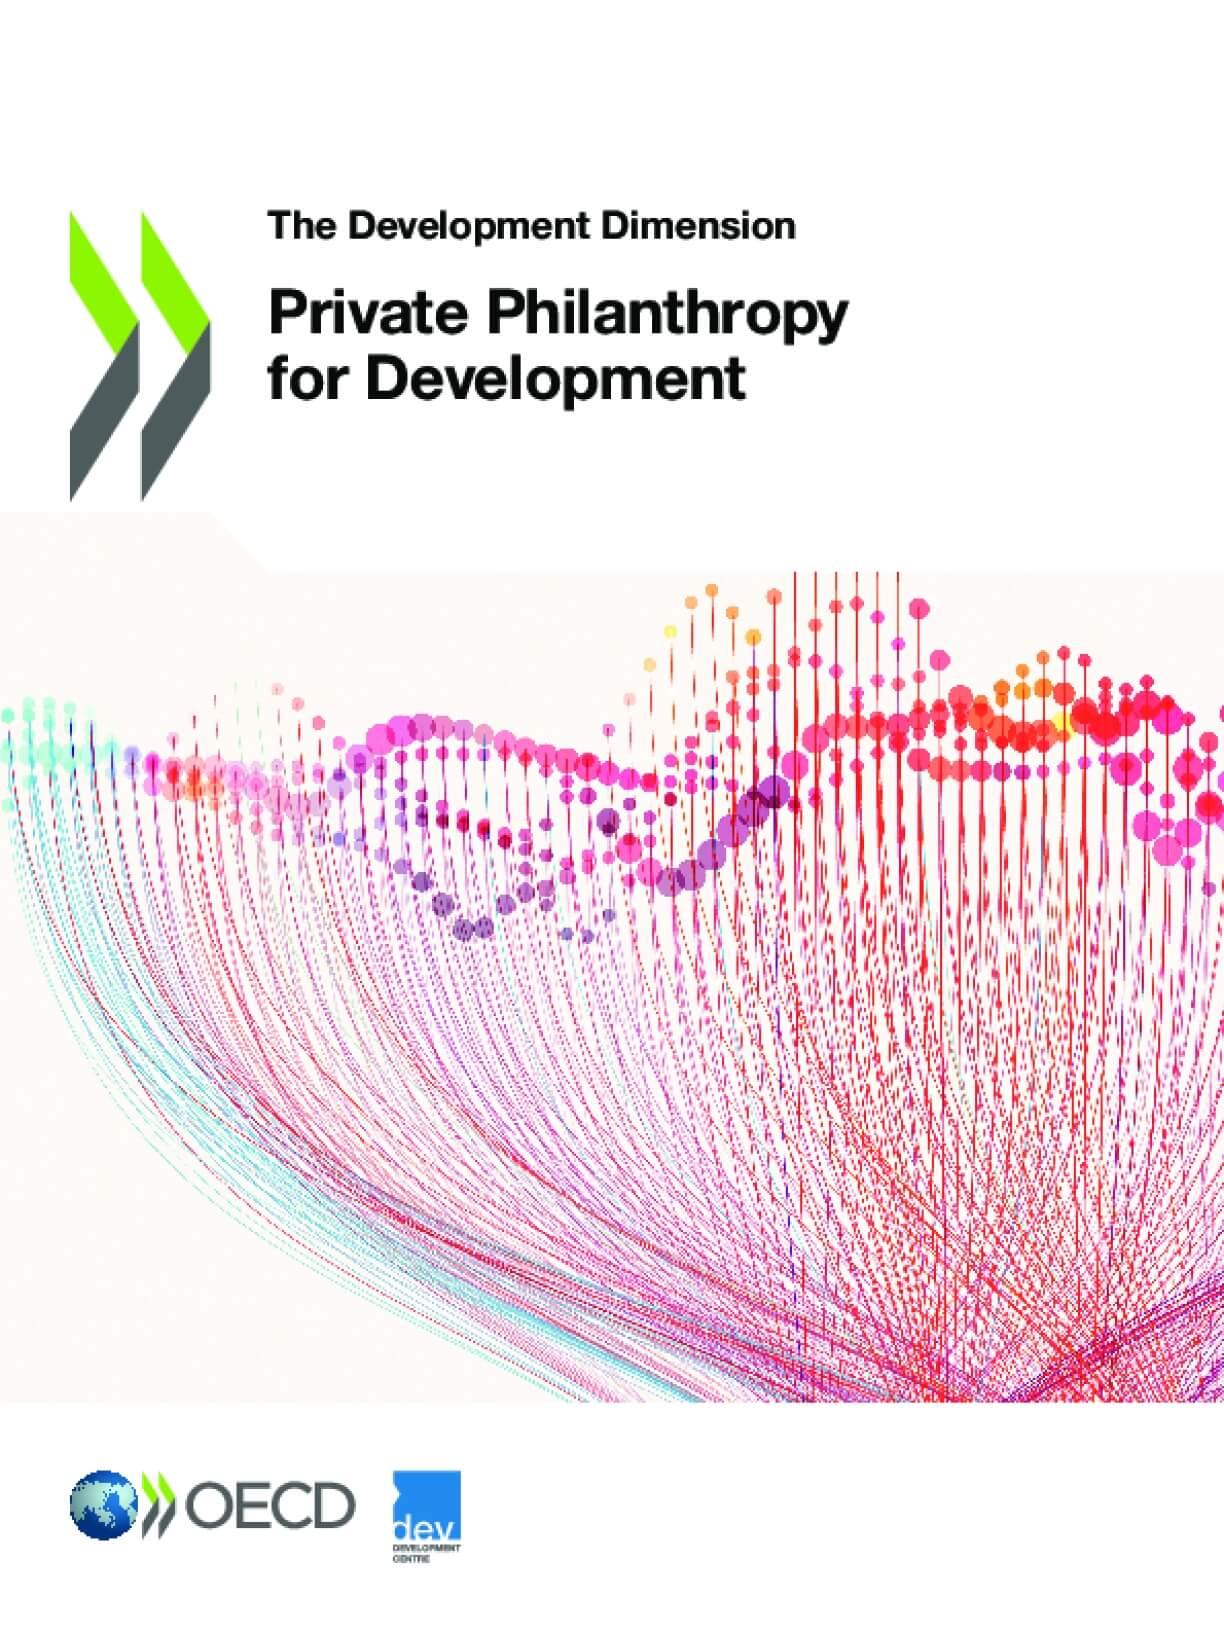 OECD 2018 Private Philanthropy for Development